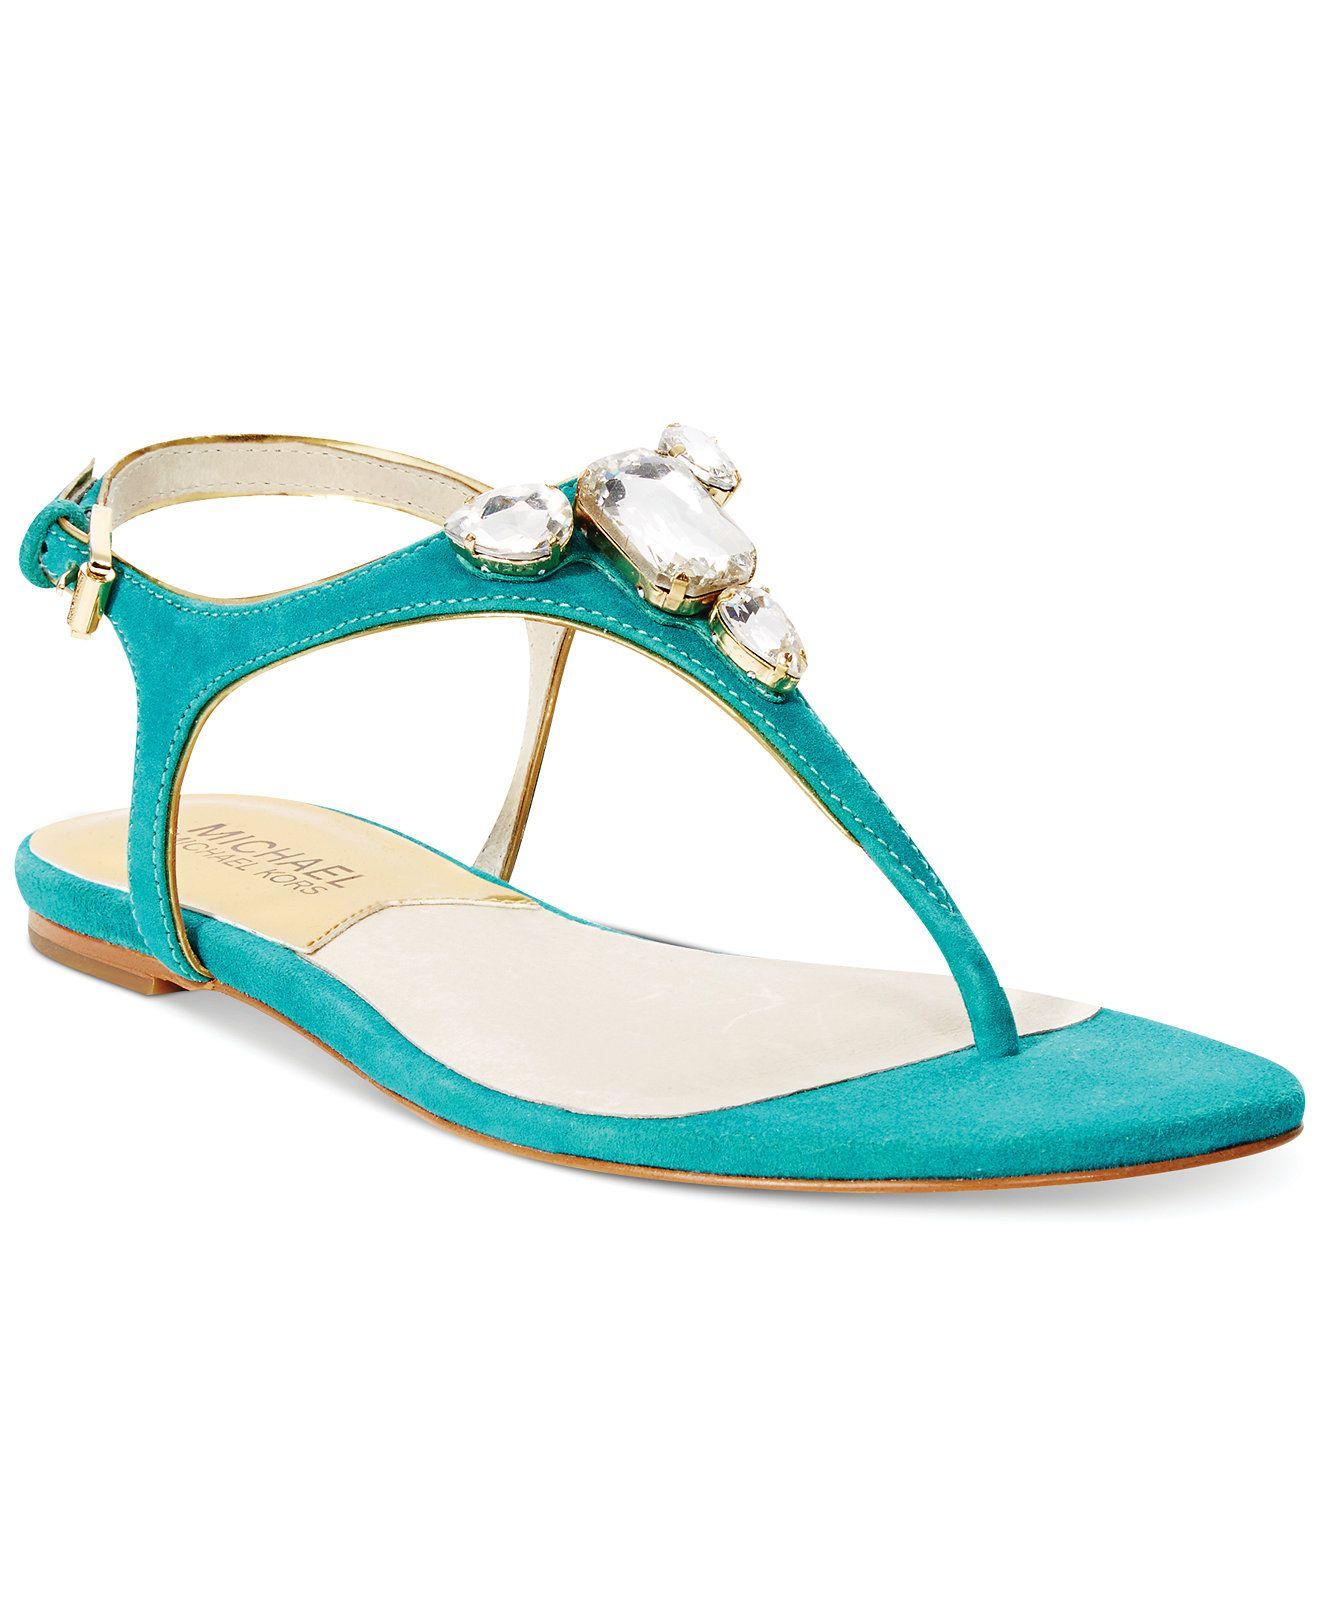 00aaa8d952e MICHAEL Michael Kors Jayden Thong Flat Sandals - Sandals - Shoes - Macy s